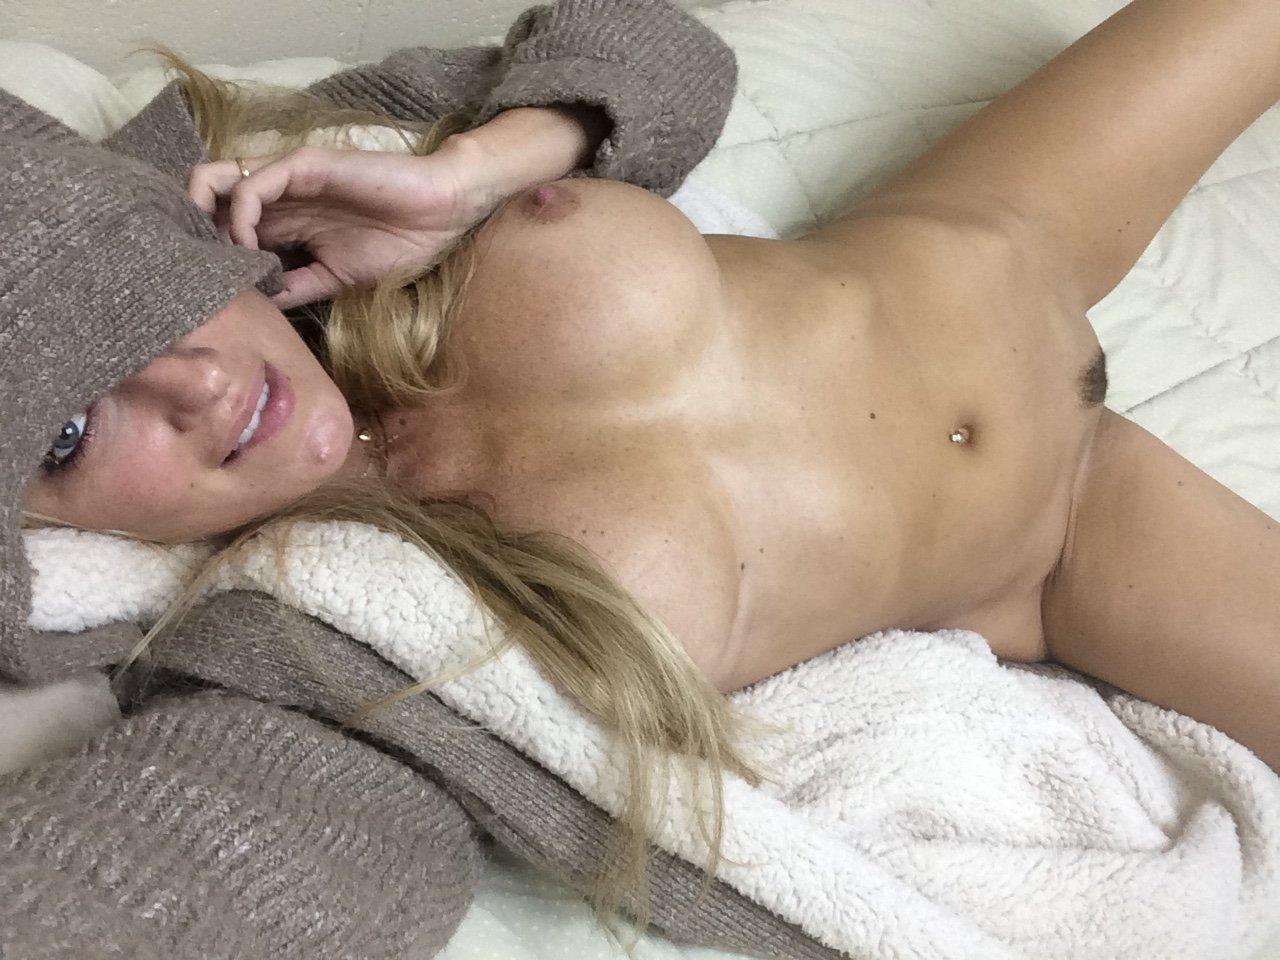 Amber Nichole pussy showing